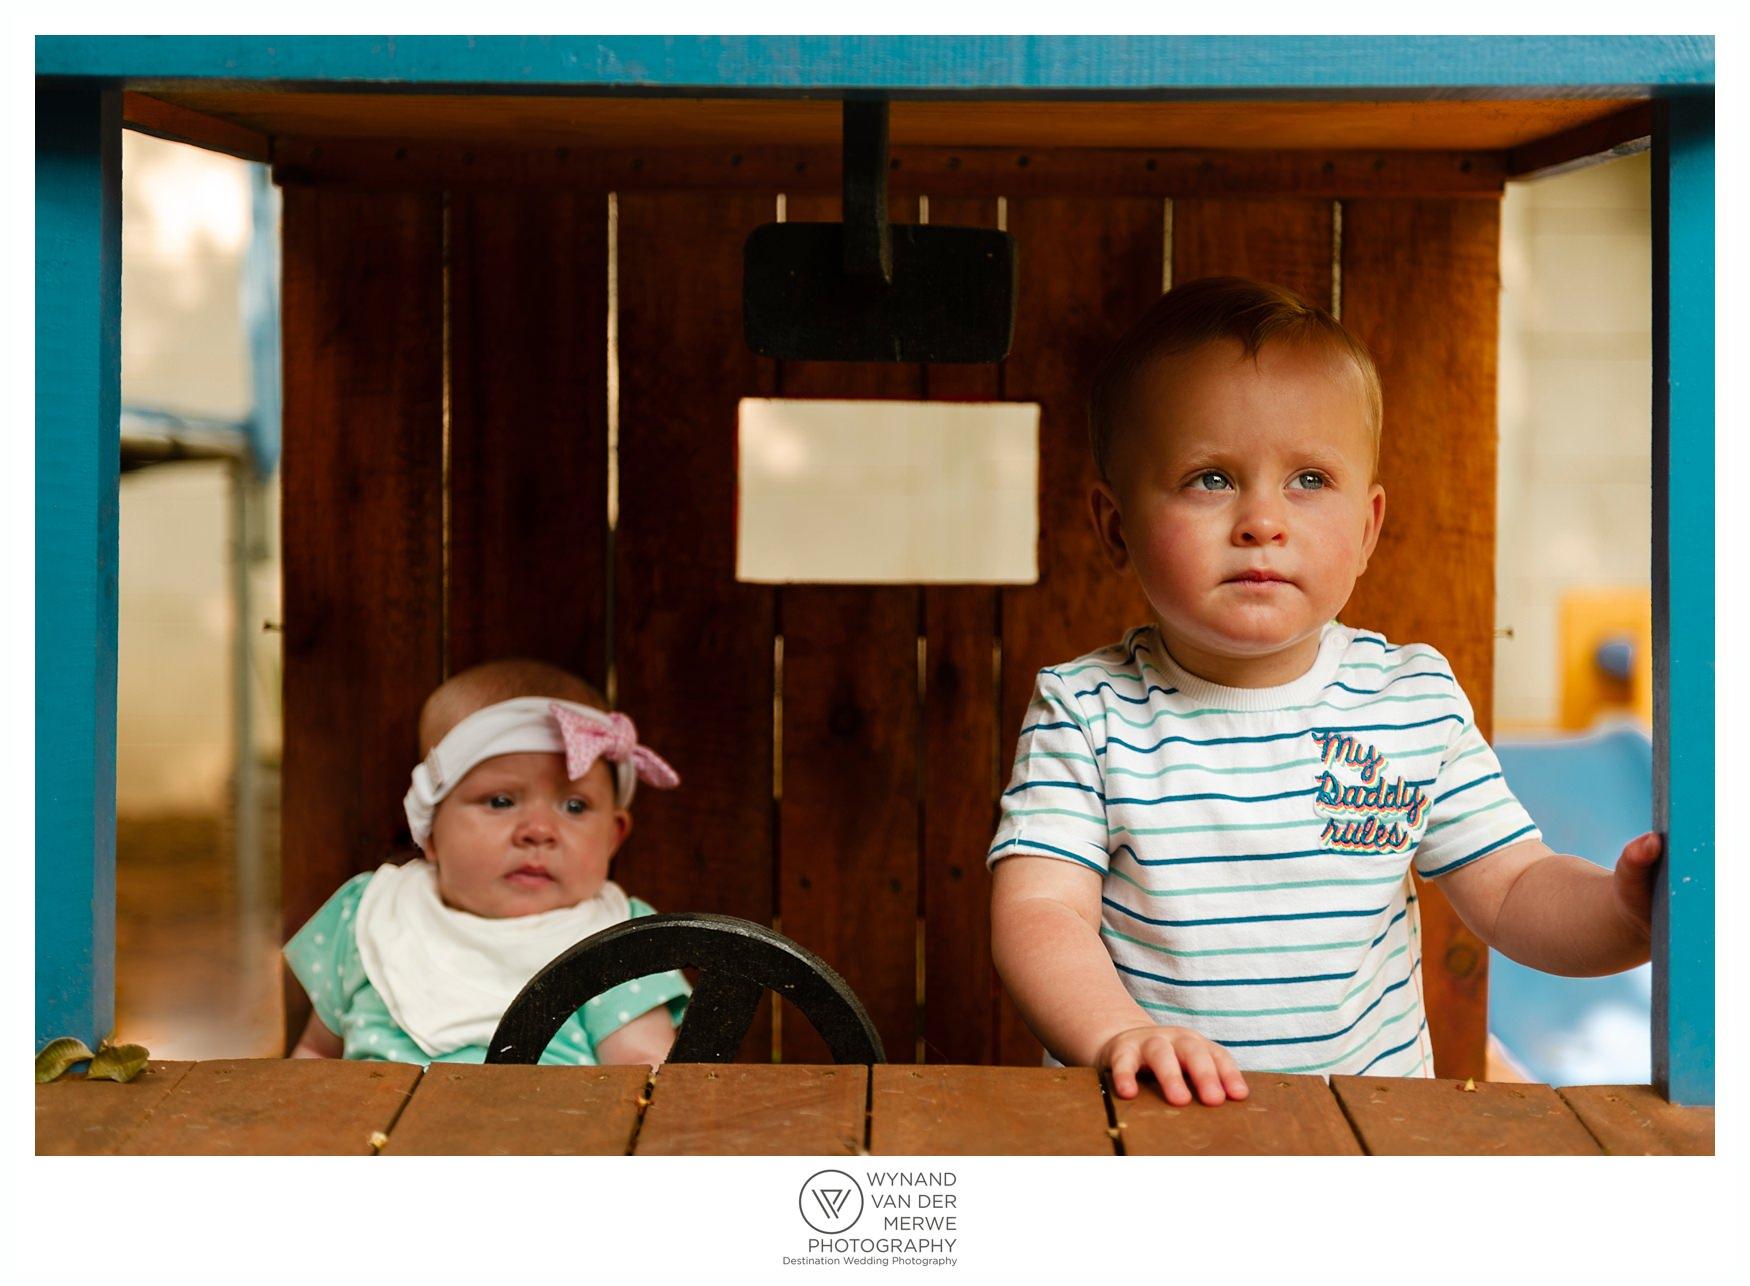 Baby Ryan has a sister, Maddison